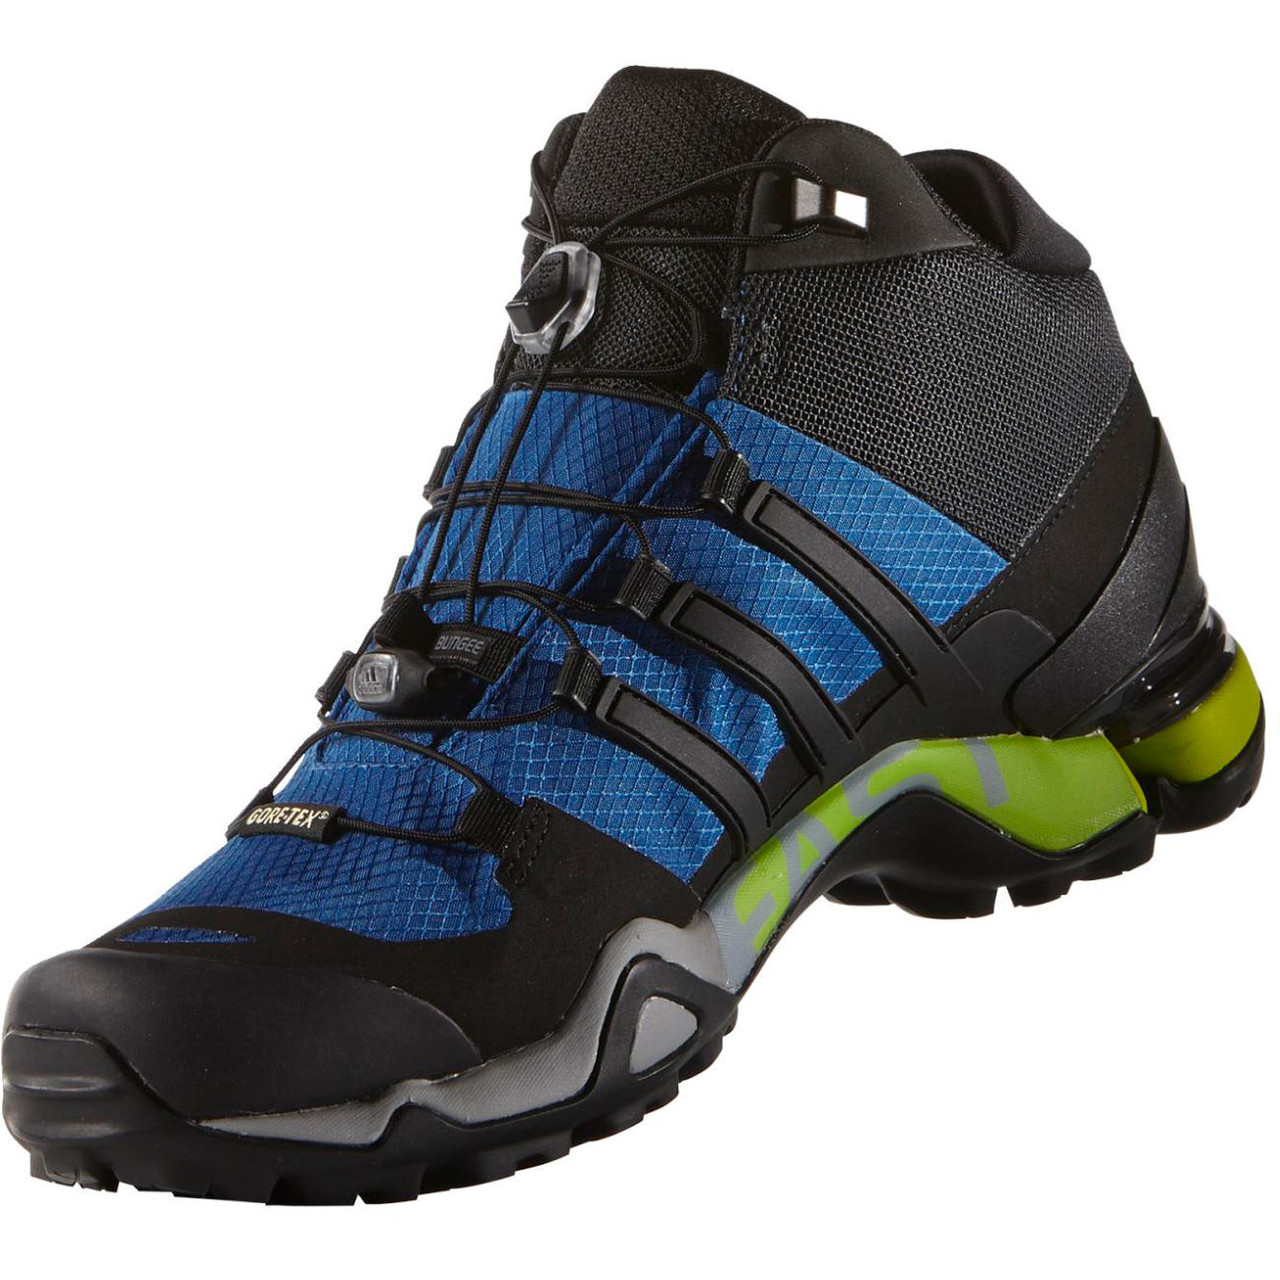 Adidas Terrex Fast R Mid GTX Shoes (SS16) - картинка 4